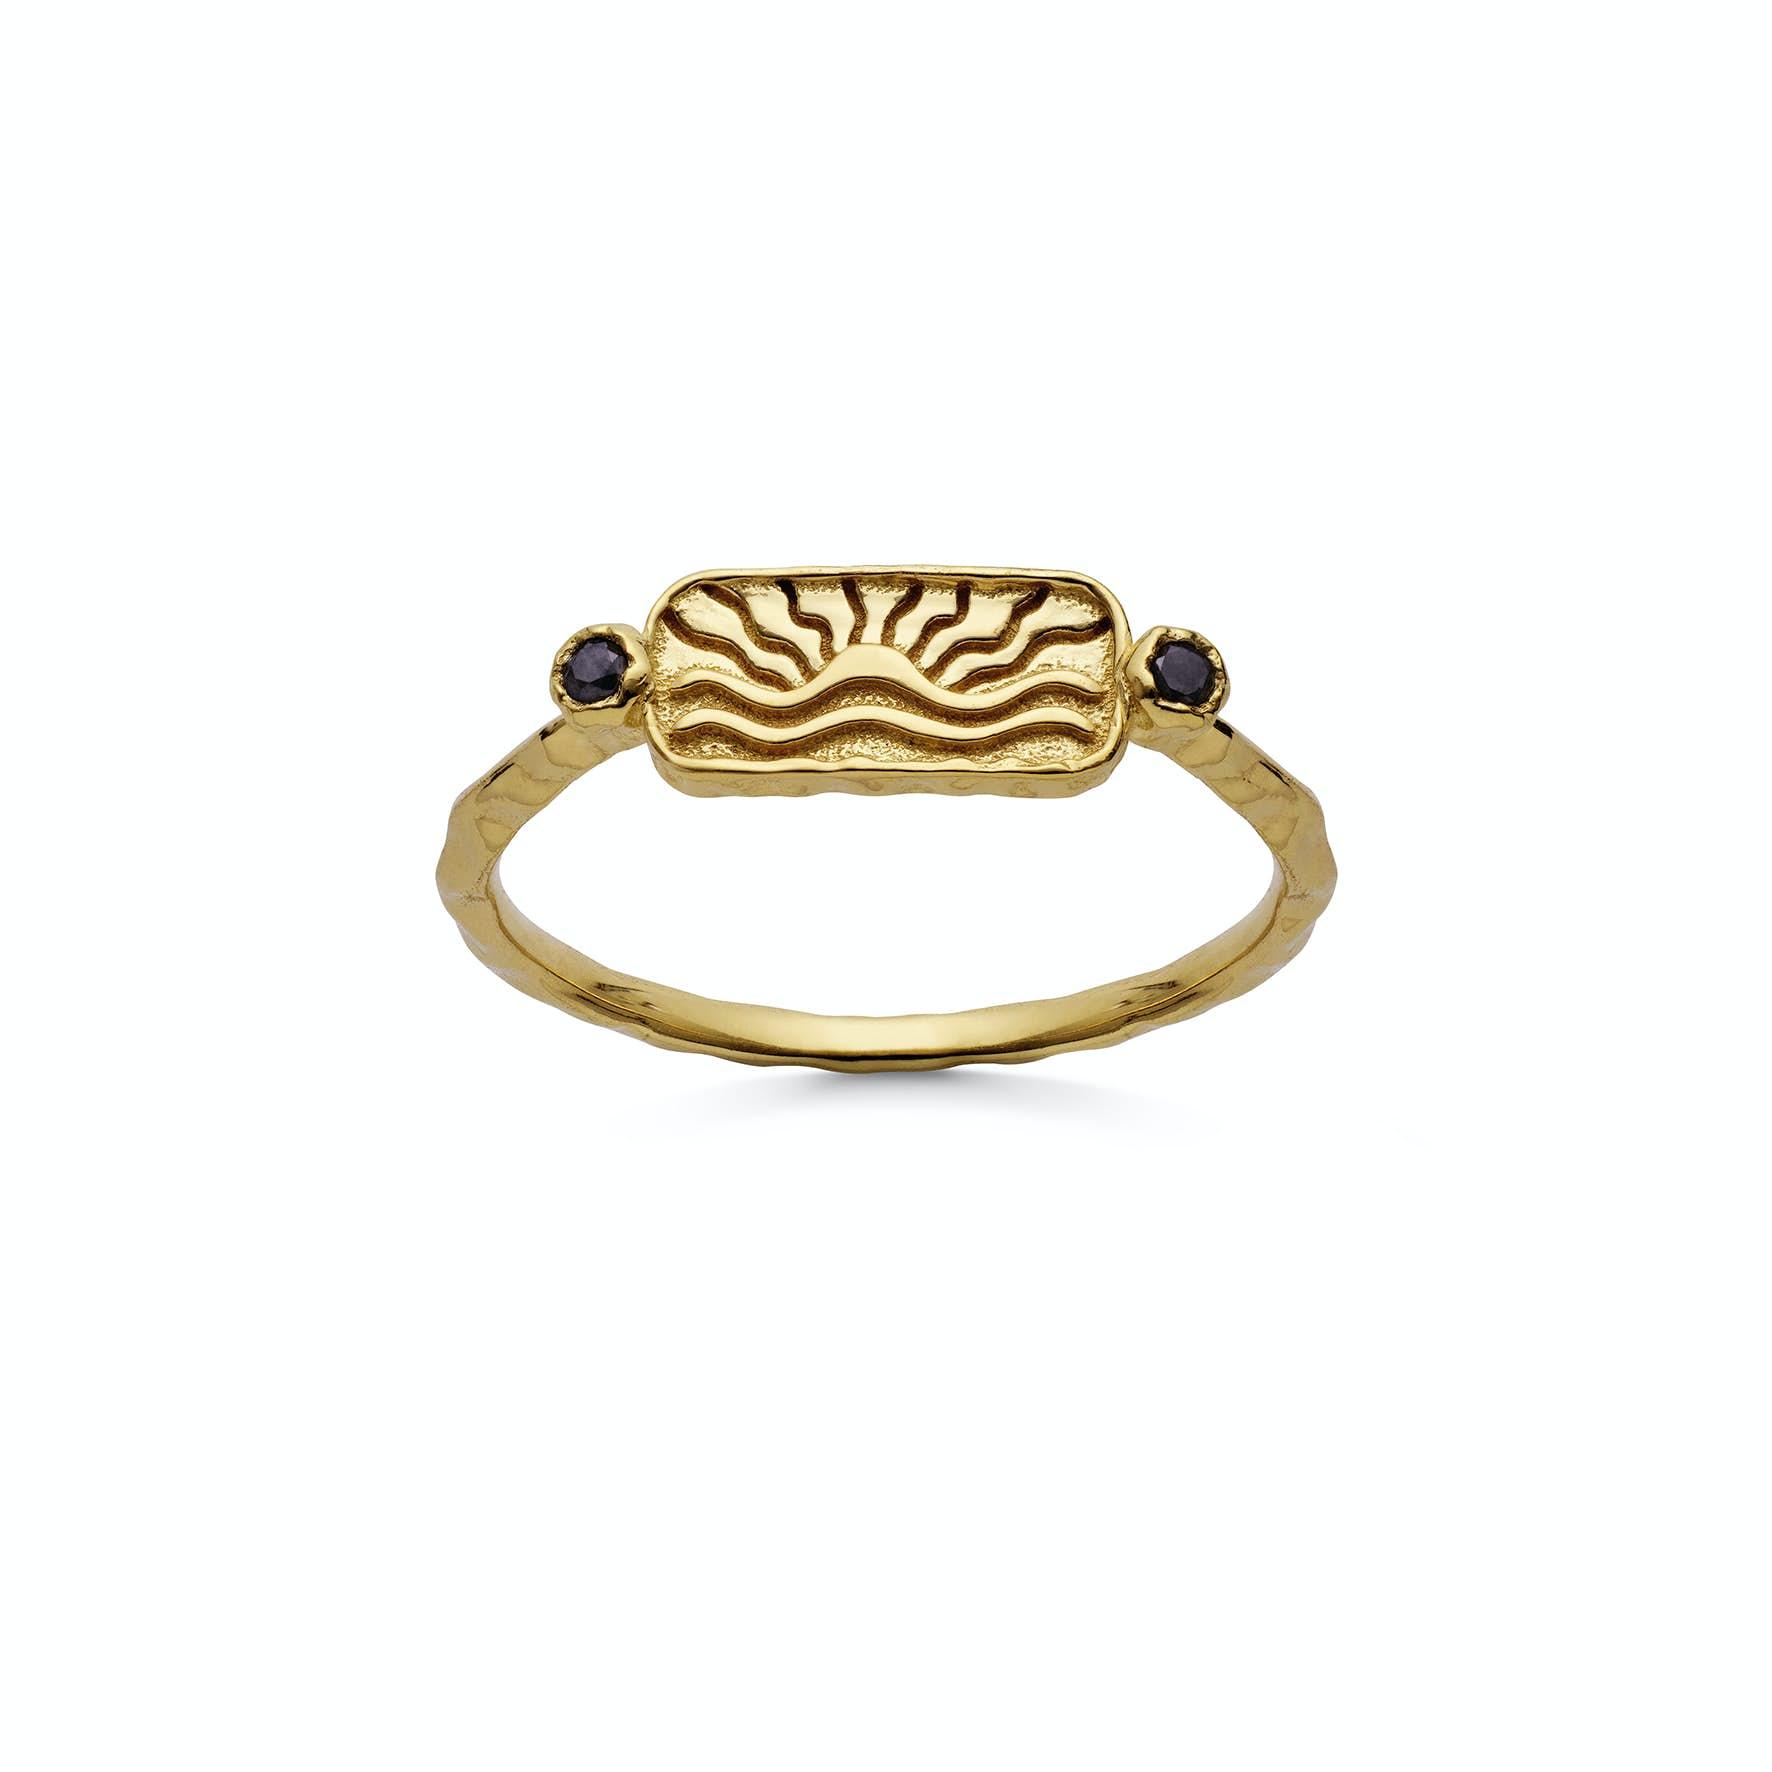 Sola Ring von Maanesten in Vergoldet-Silber Sterling 925